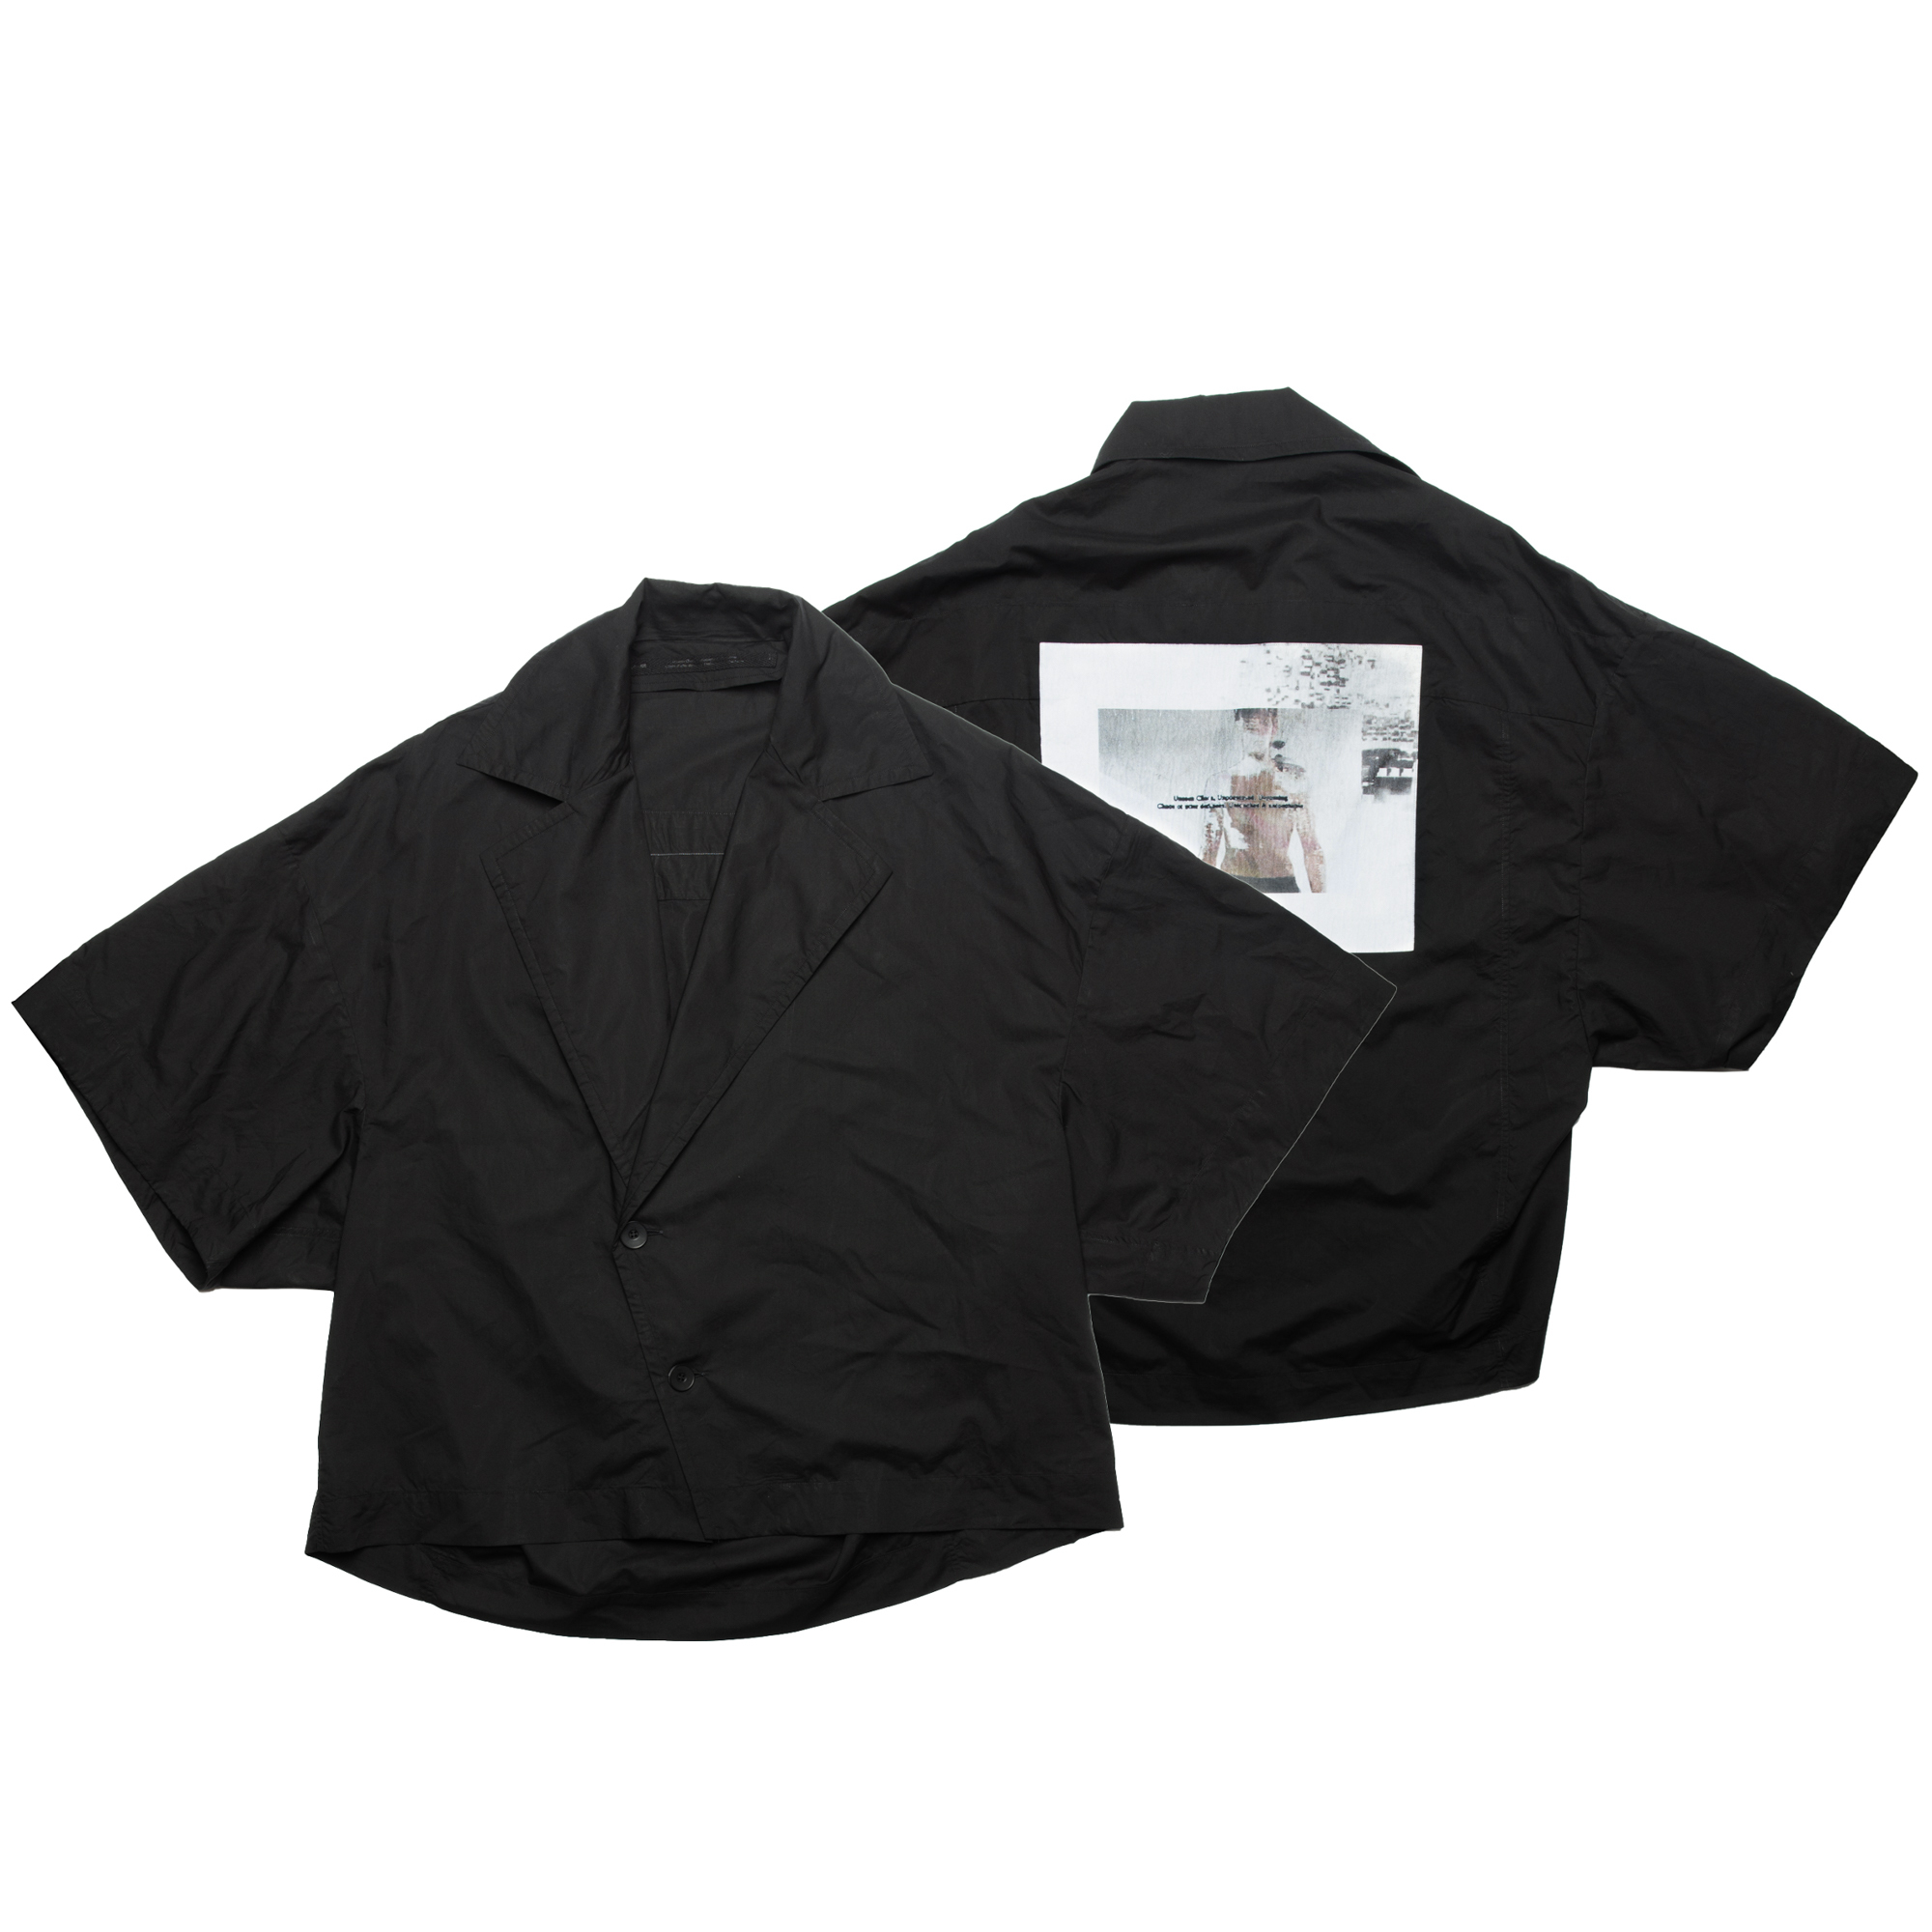 657SHM3-P-BLACK / プリントオープンカラーボックスシャツ